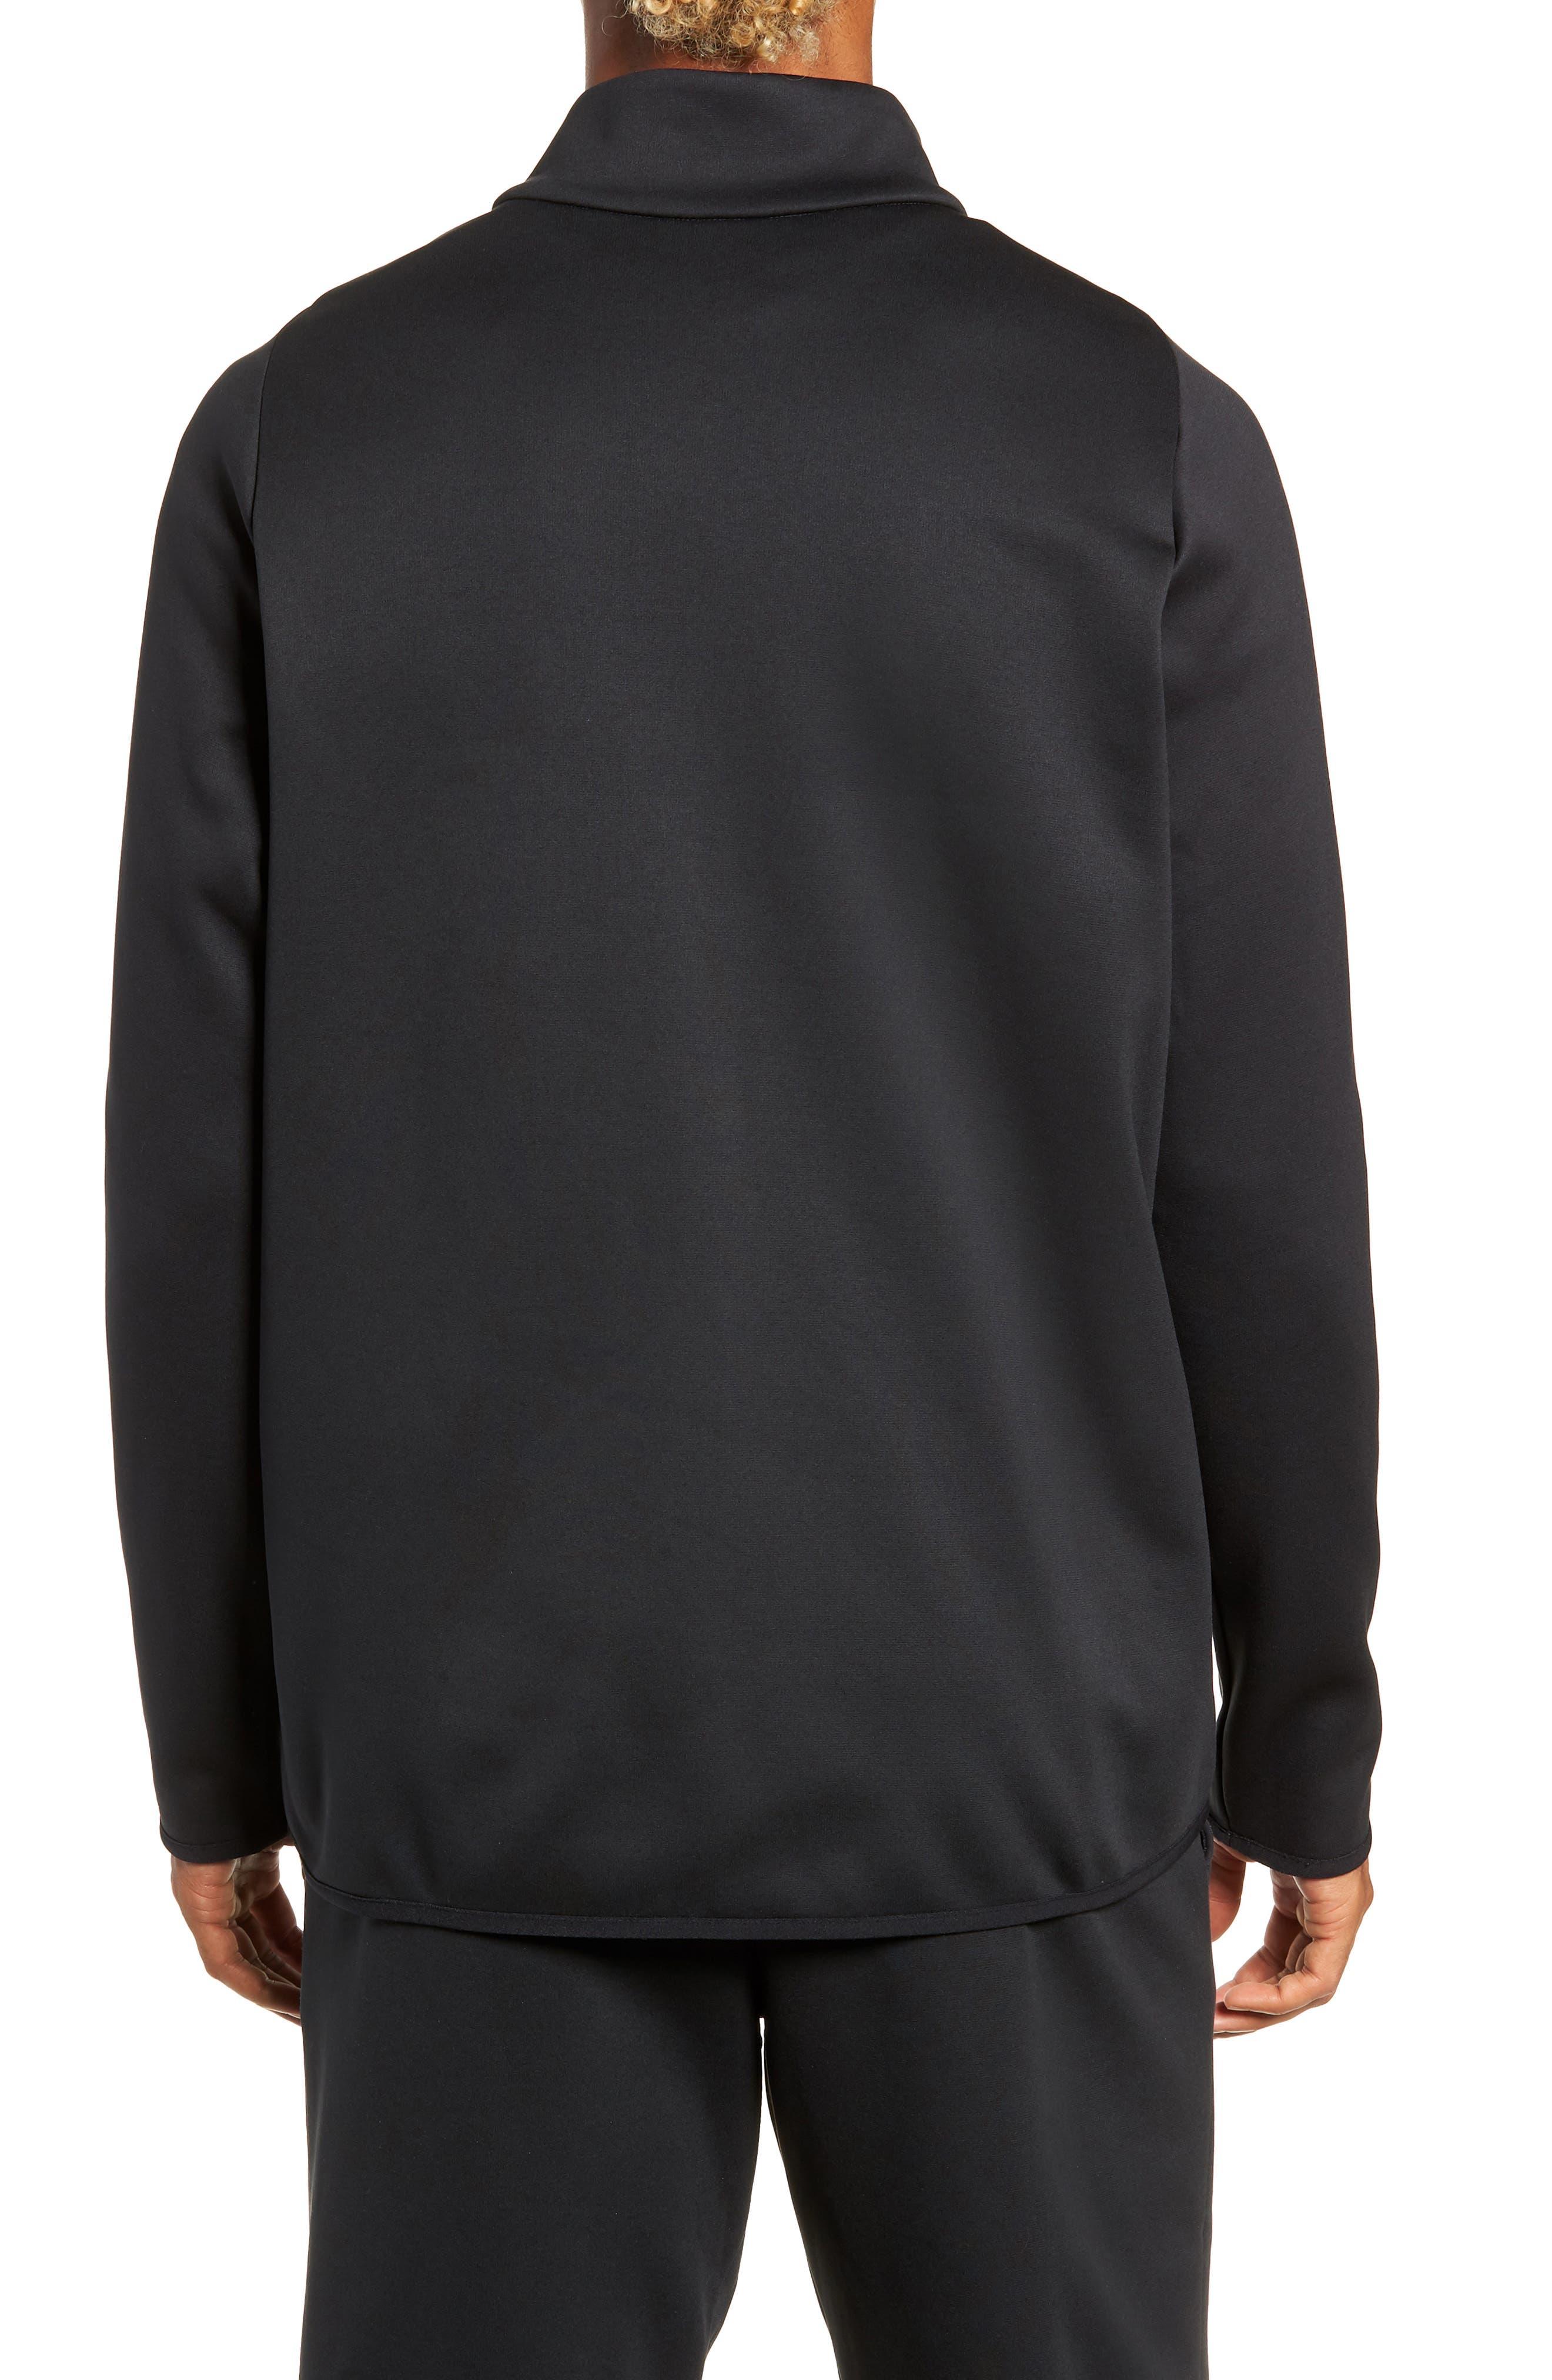 Quarter Zip Pullover,                             Alternate thumbnail 2, color,                             BLACK/ DARK GREY